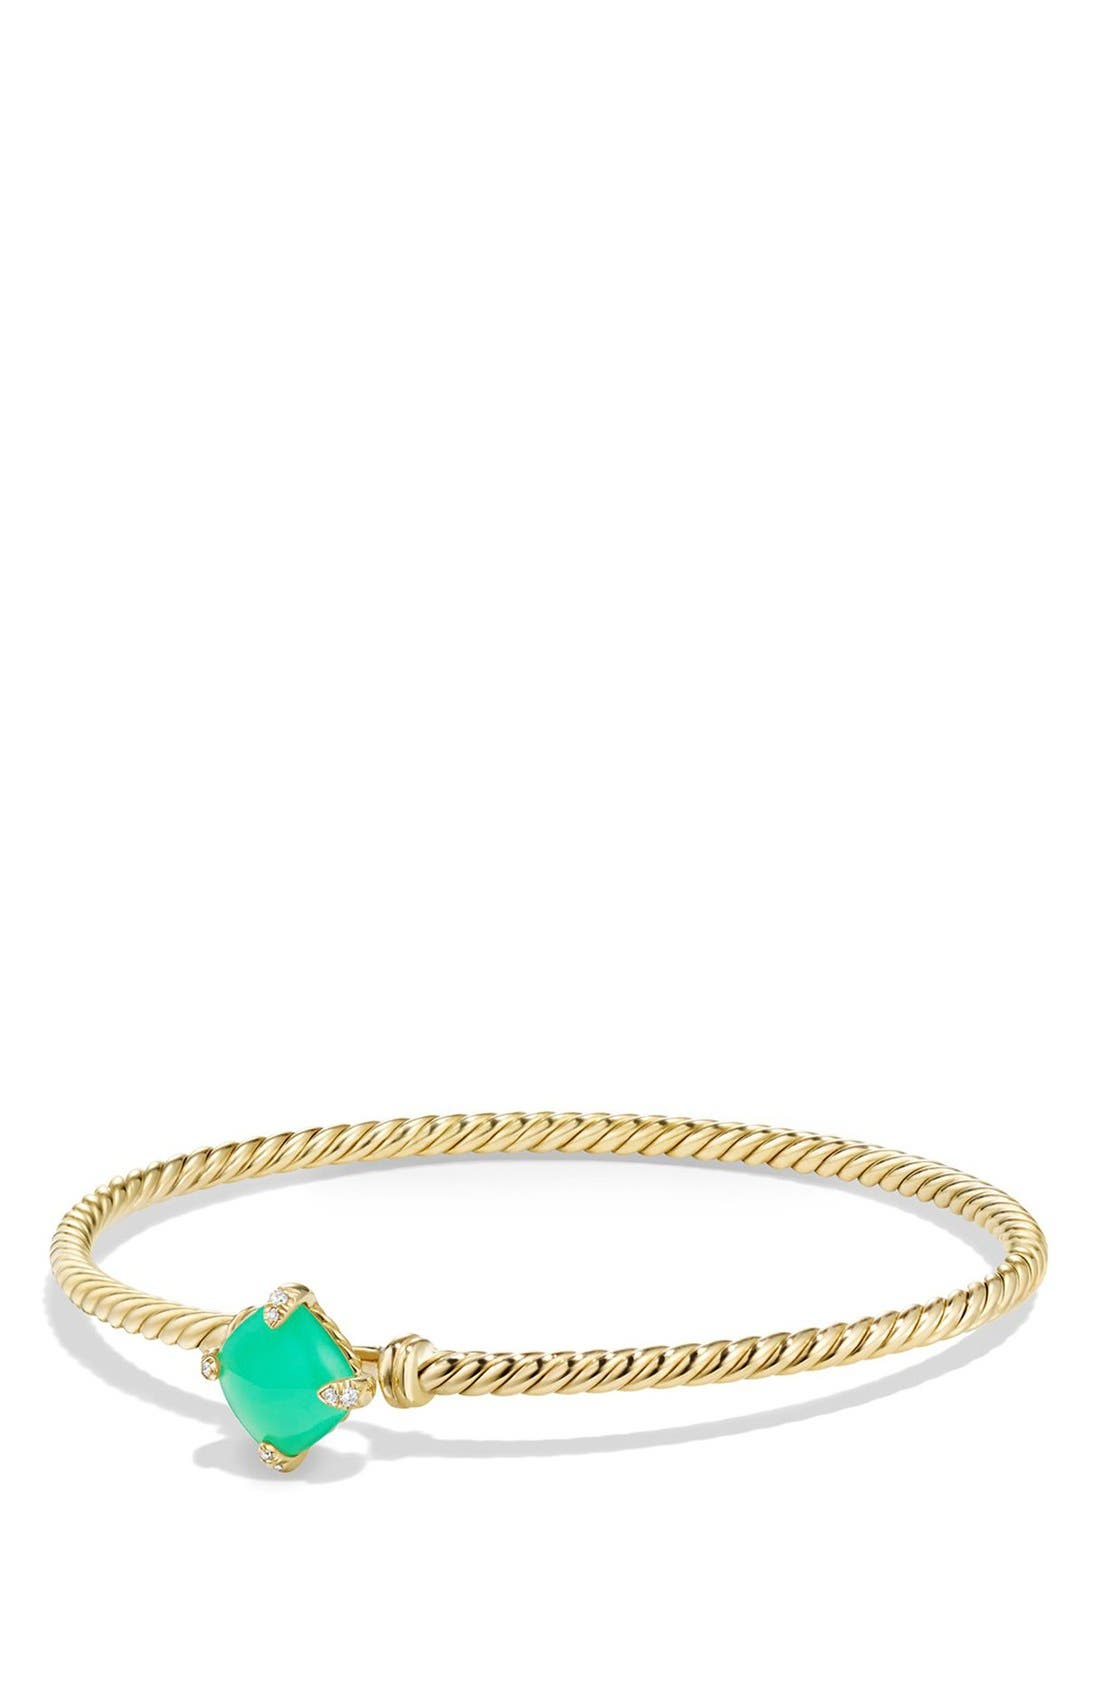 David Yurman 'Châtelaine' Bracelet in 18K Gold with Diamonds